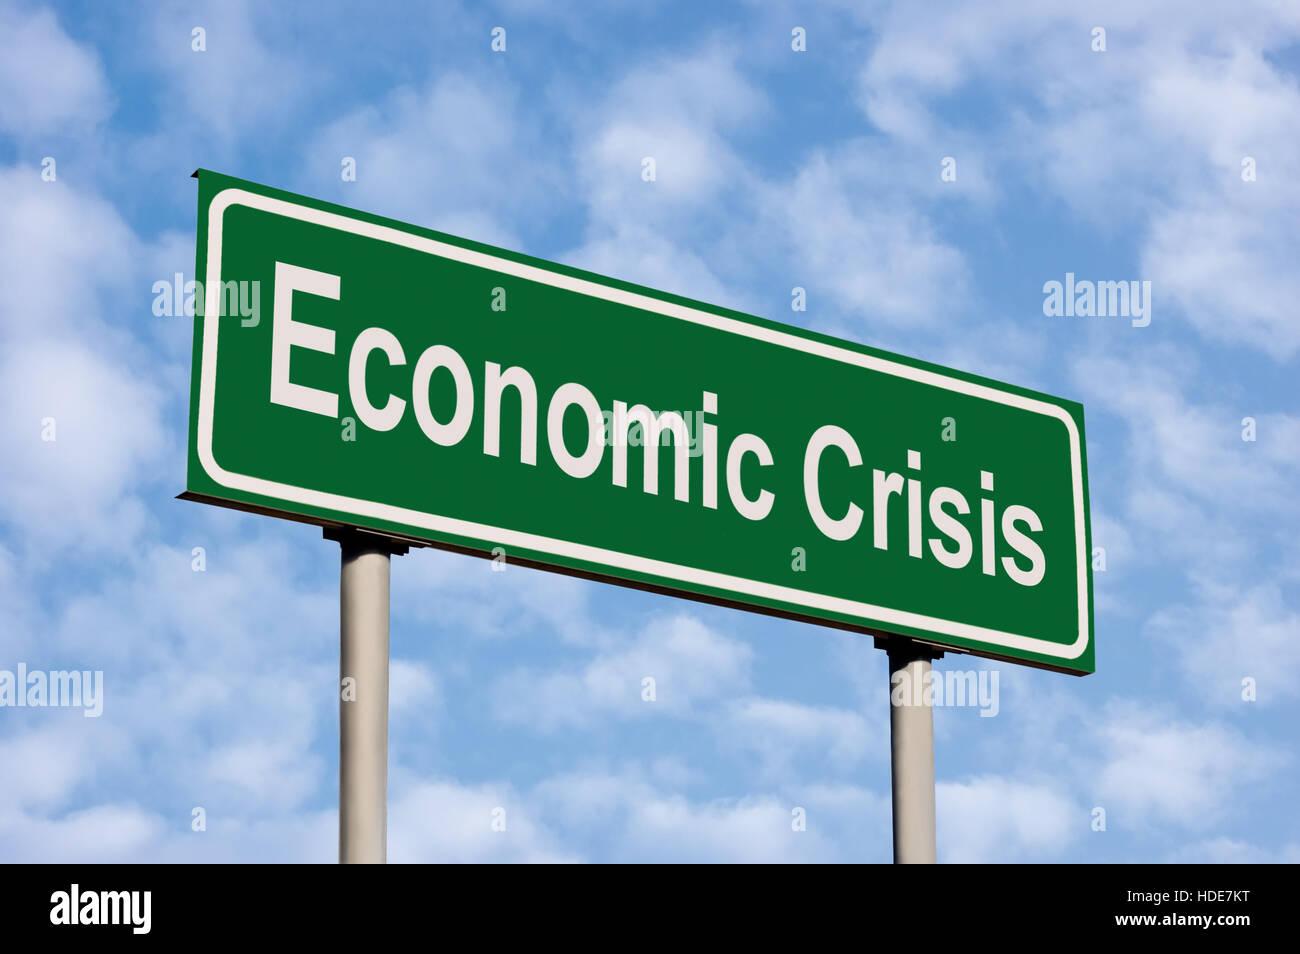 Economic Crisis Green Road Sign, Against Light Cloudscape Sky - Stock Image